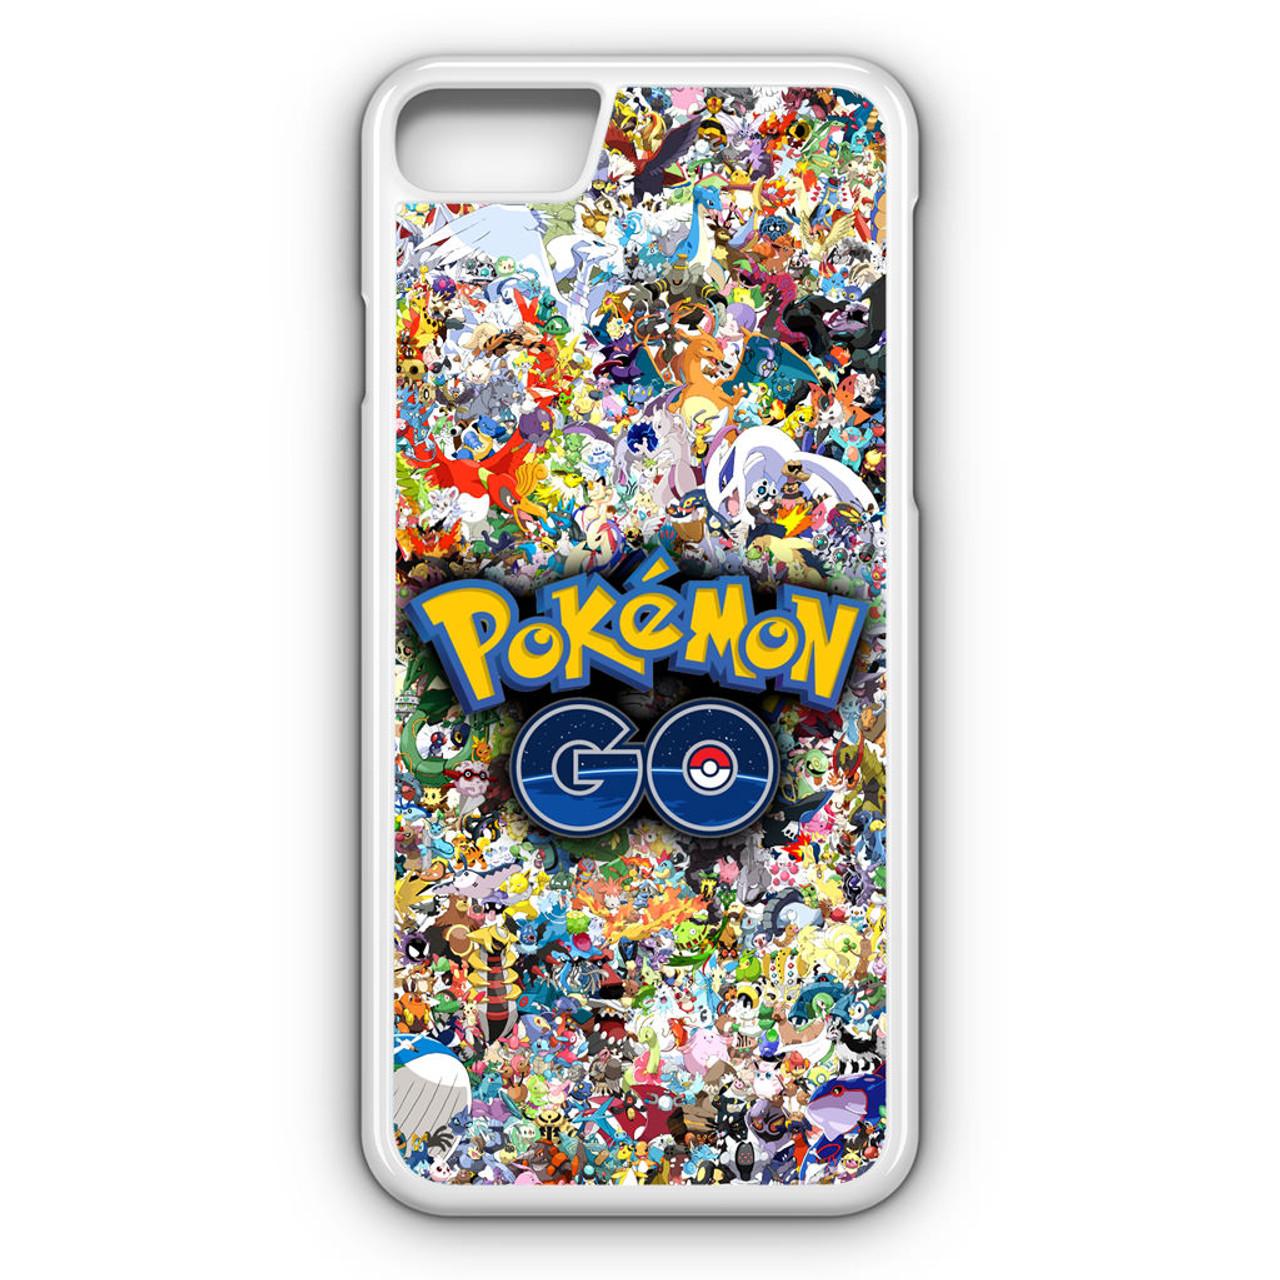 Pokemons iphone case